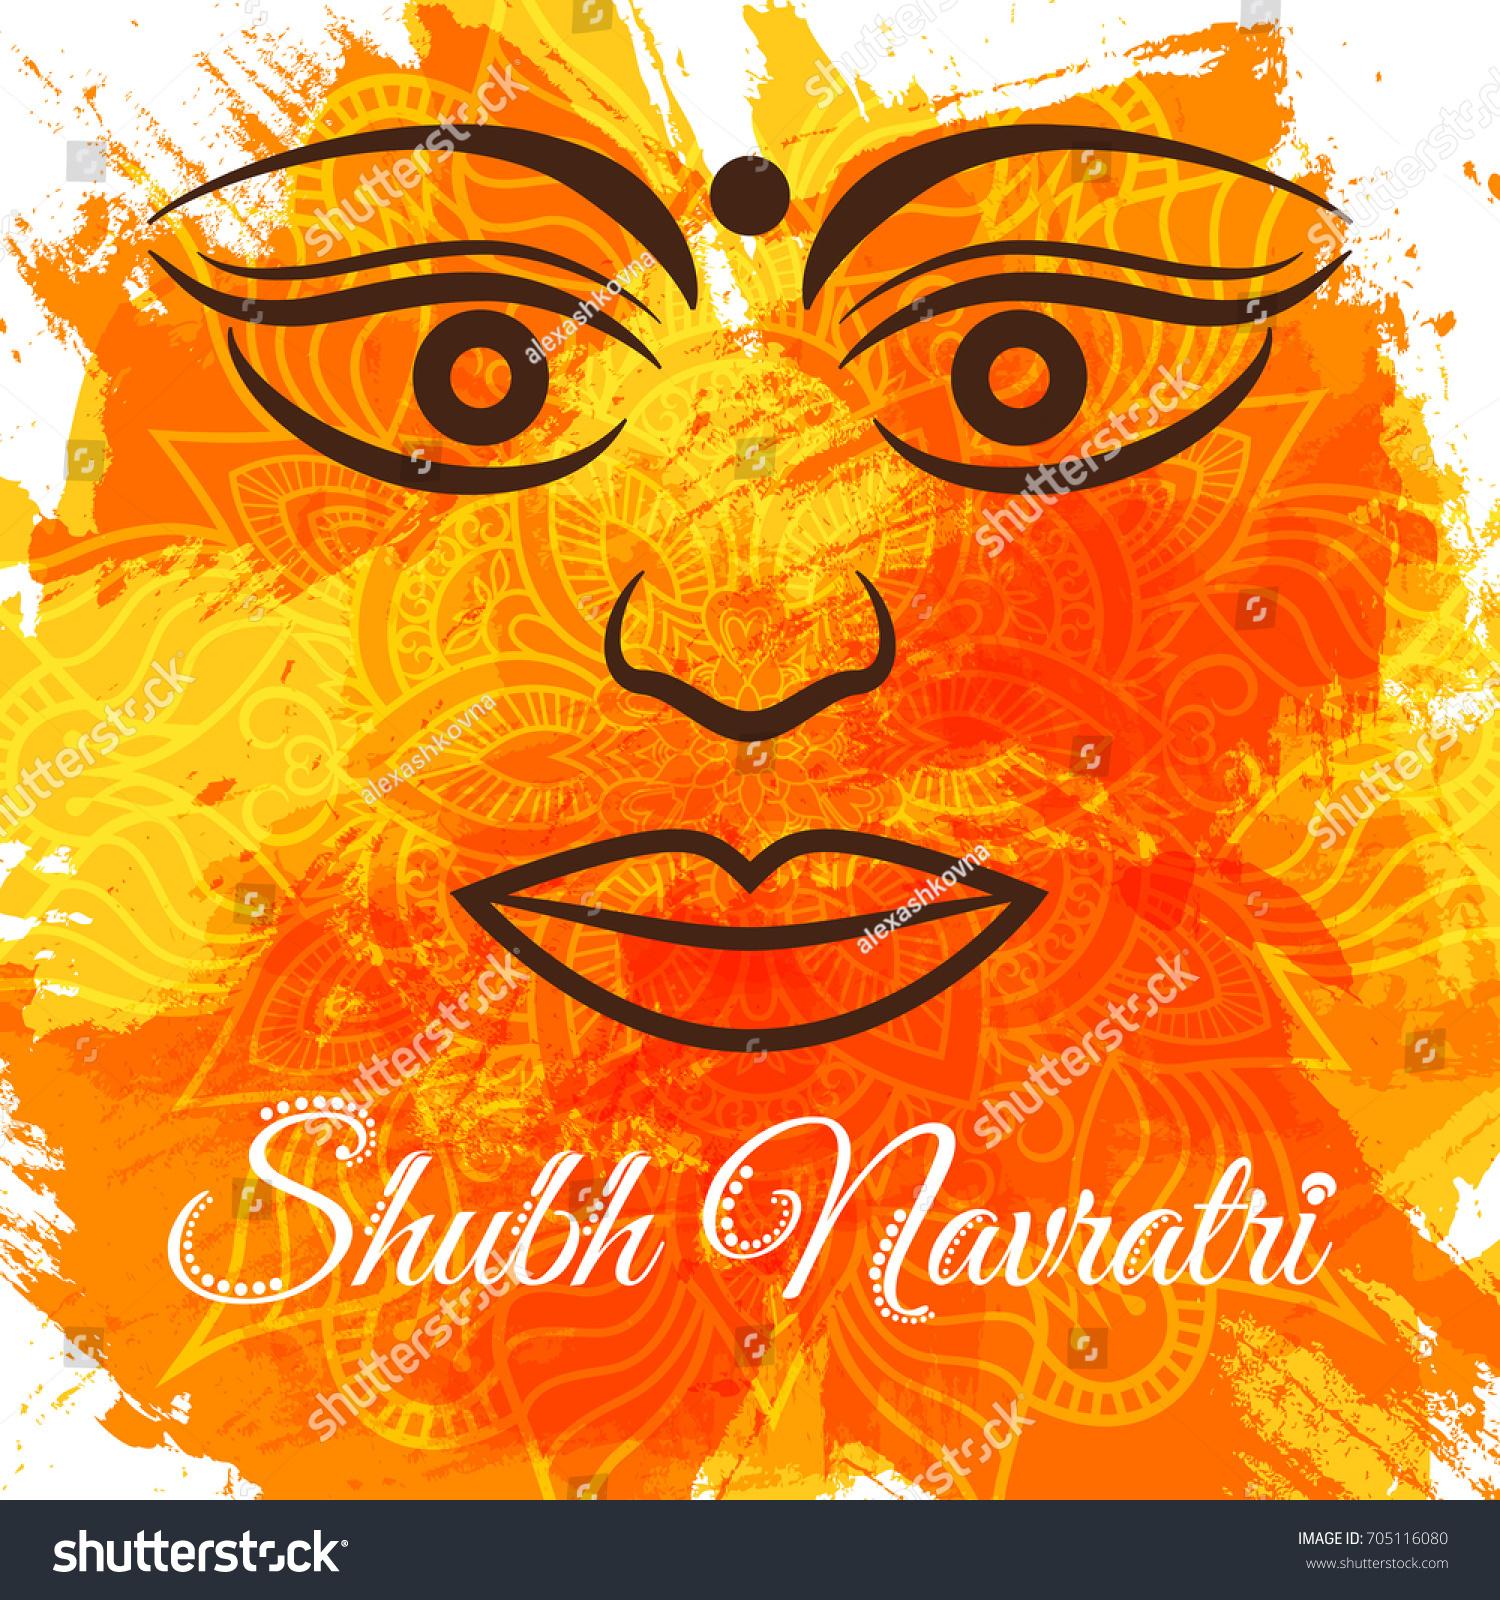 Shubh Navratri Durga Puja Greeting Poster Stock Vector 705116080